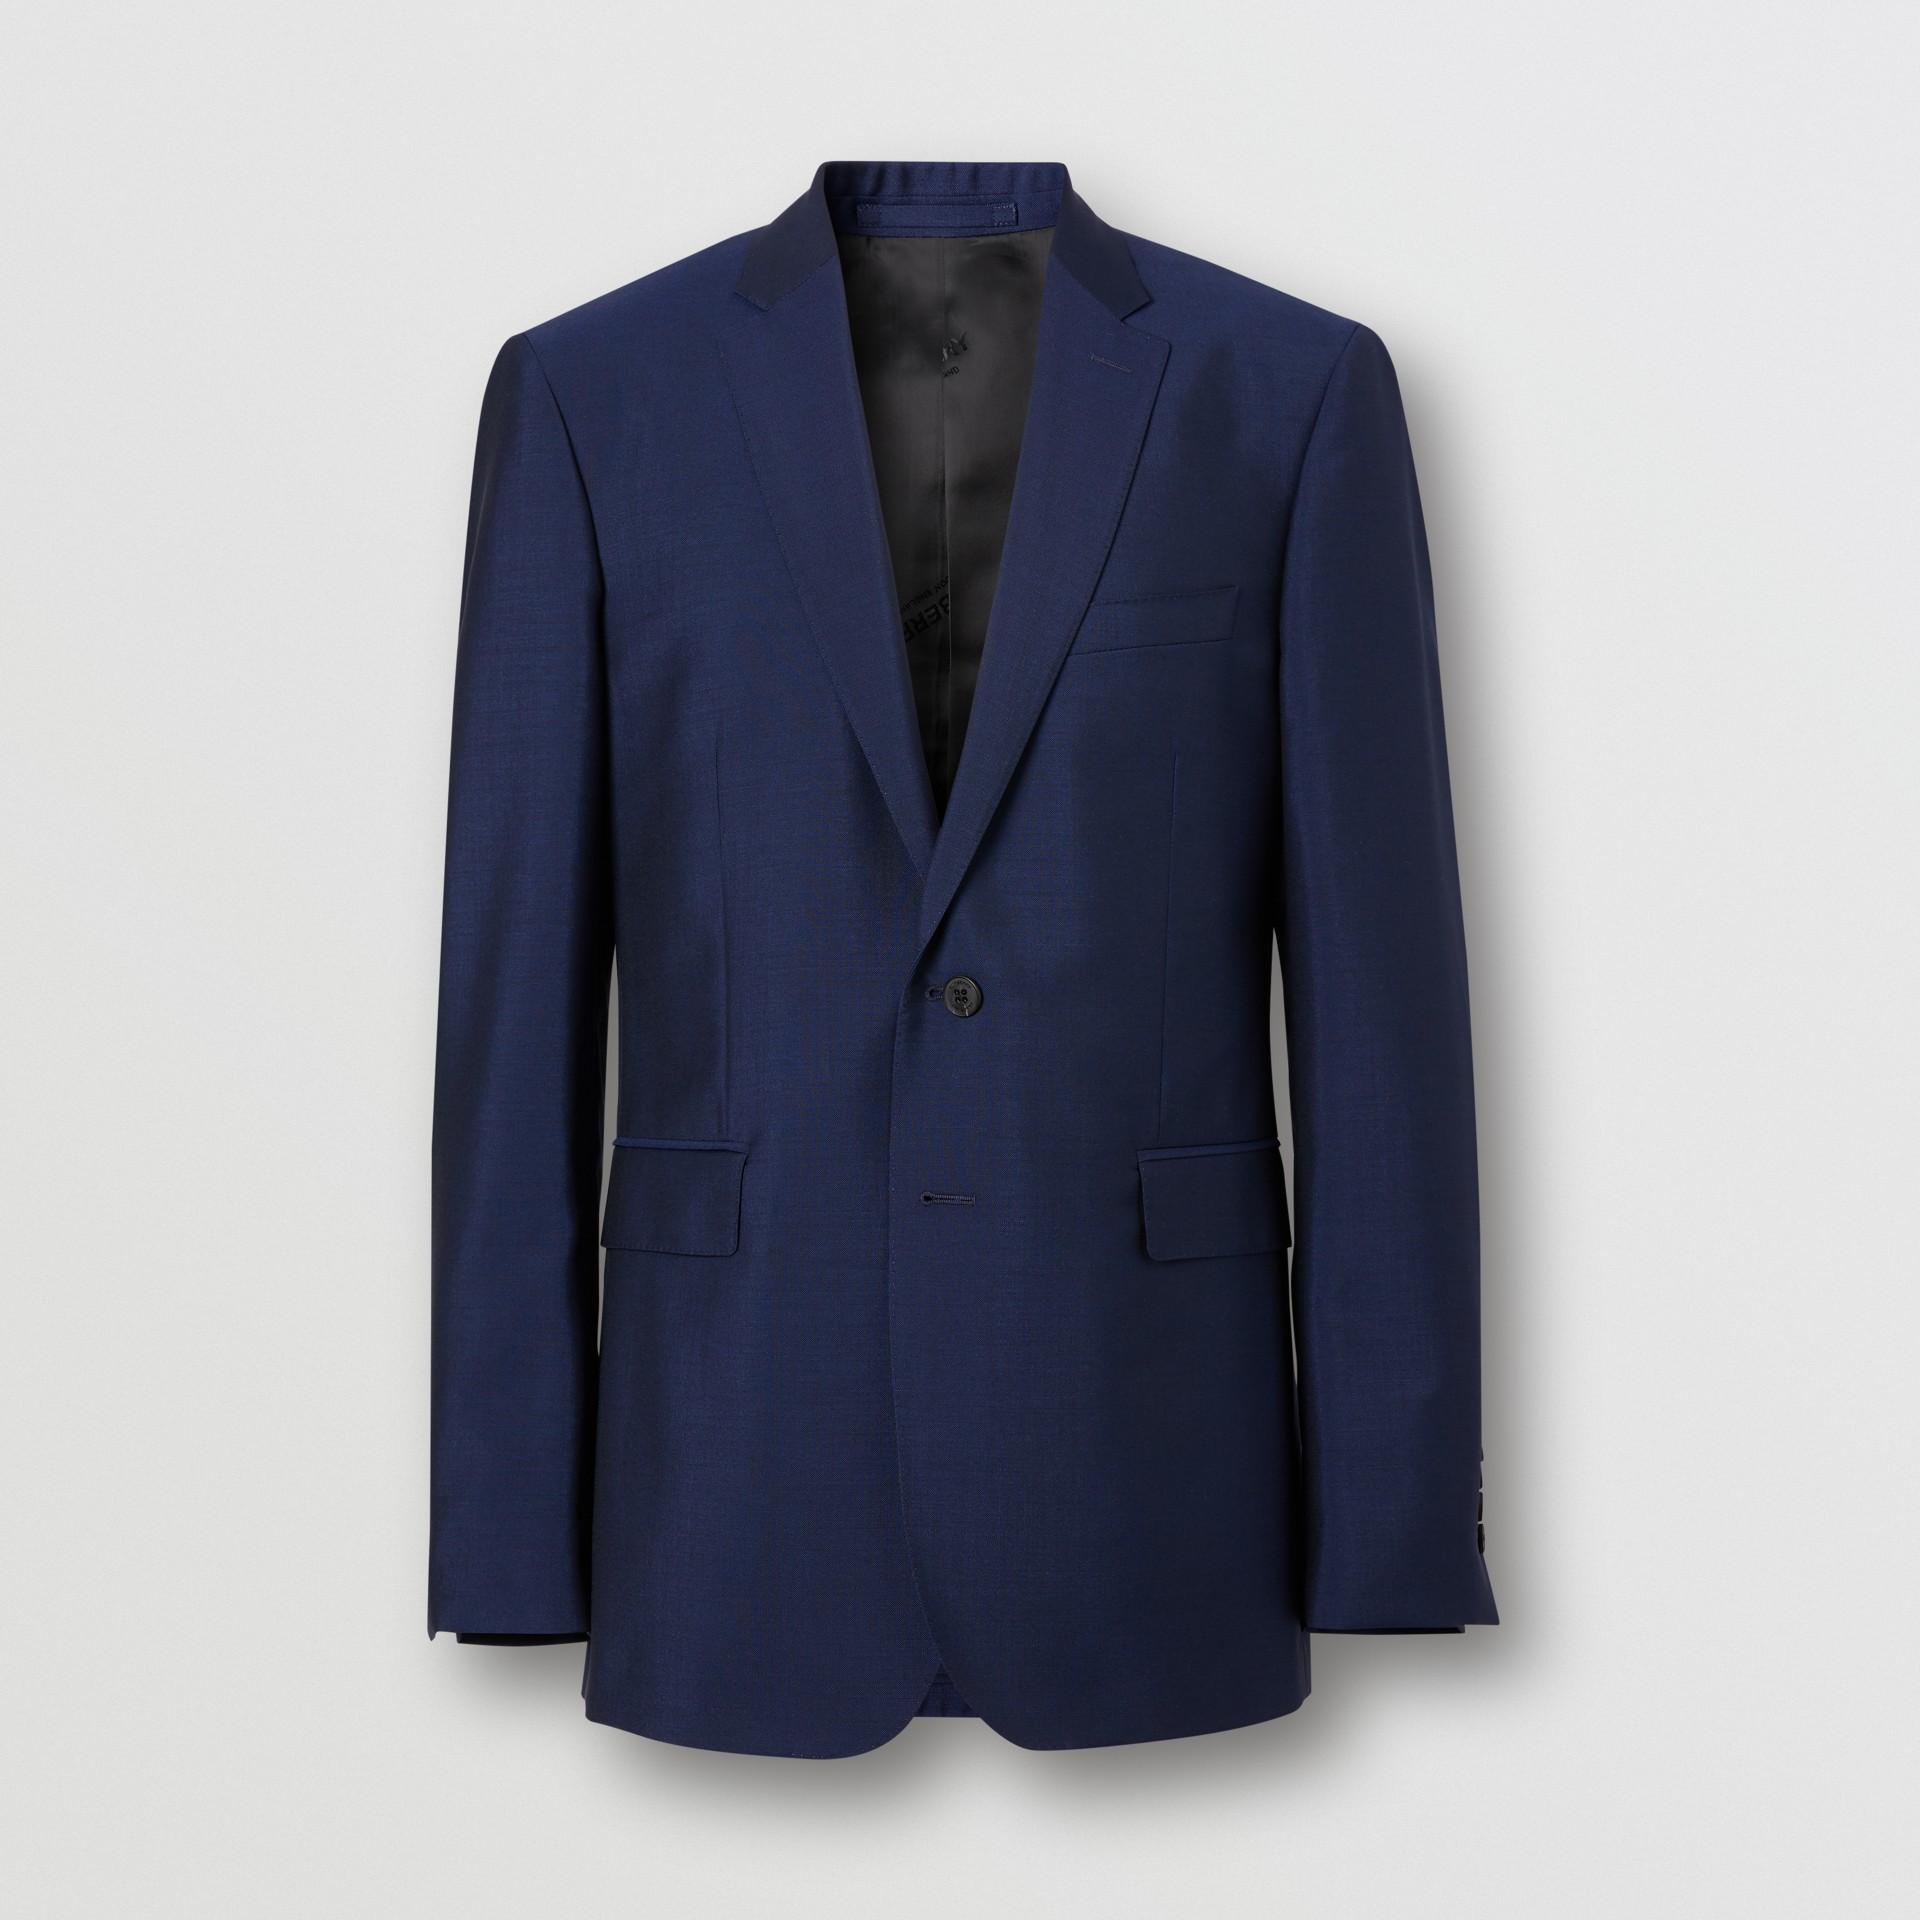 Slim Fit Wool Mohair Suit in Bright Navy - Men | Burberry United Kingdom - gallery image 3